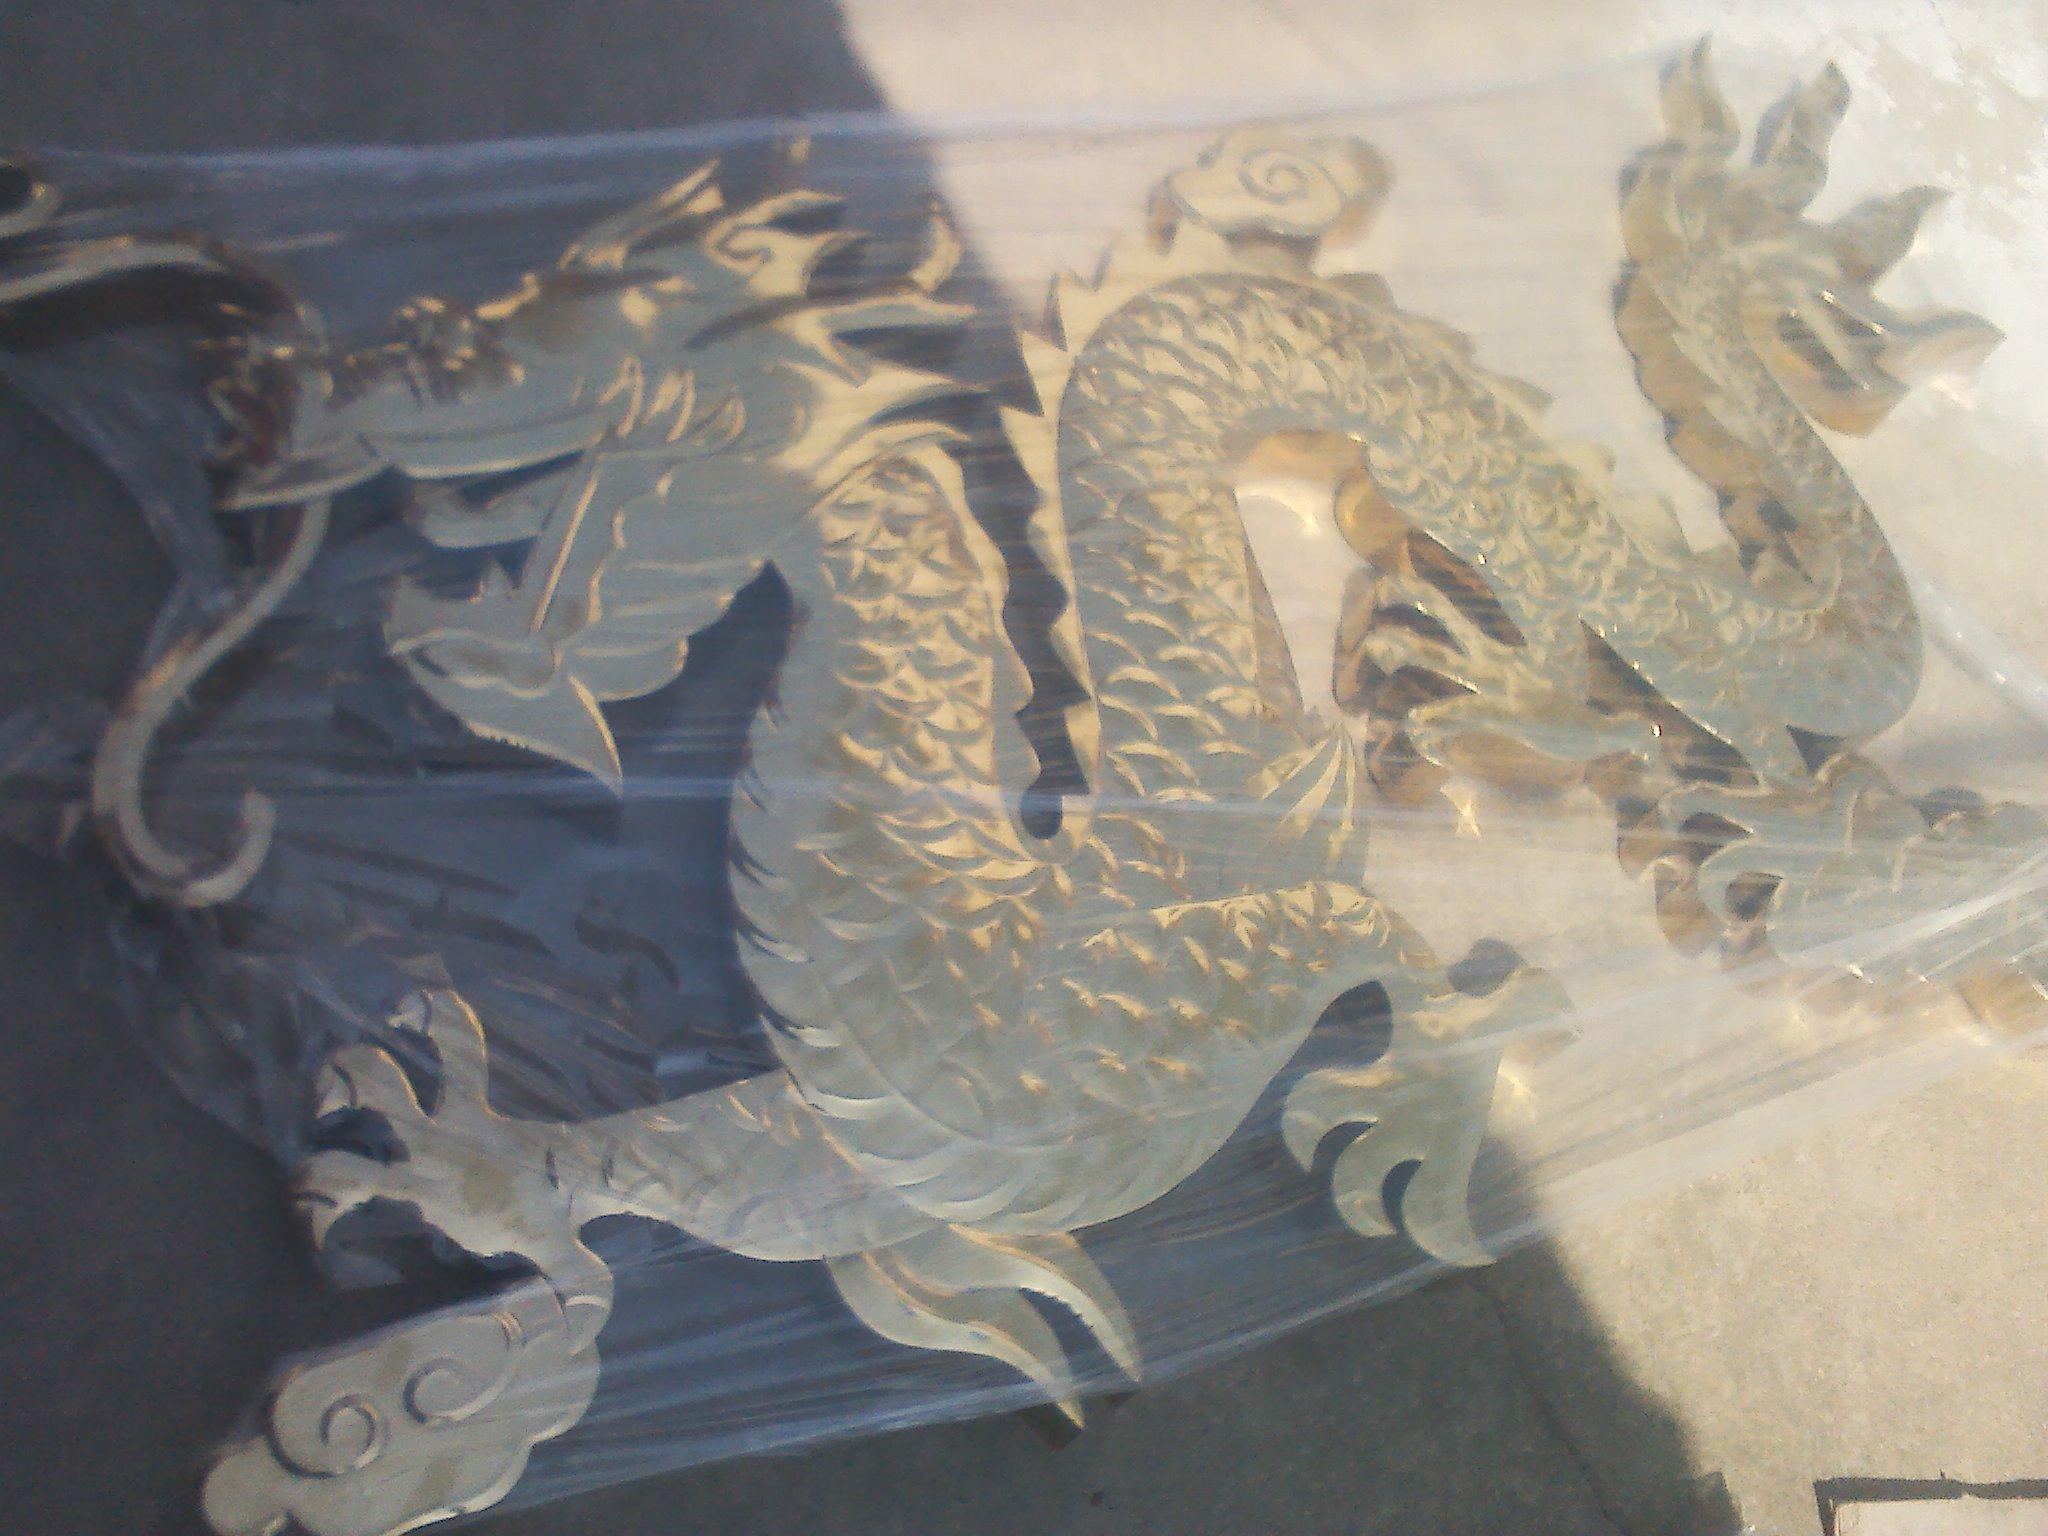 Spherical titanium titanium gold dragon head word Laofengxiang process